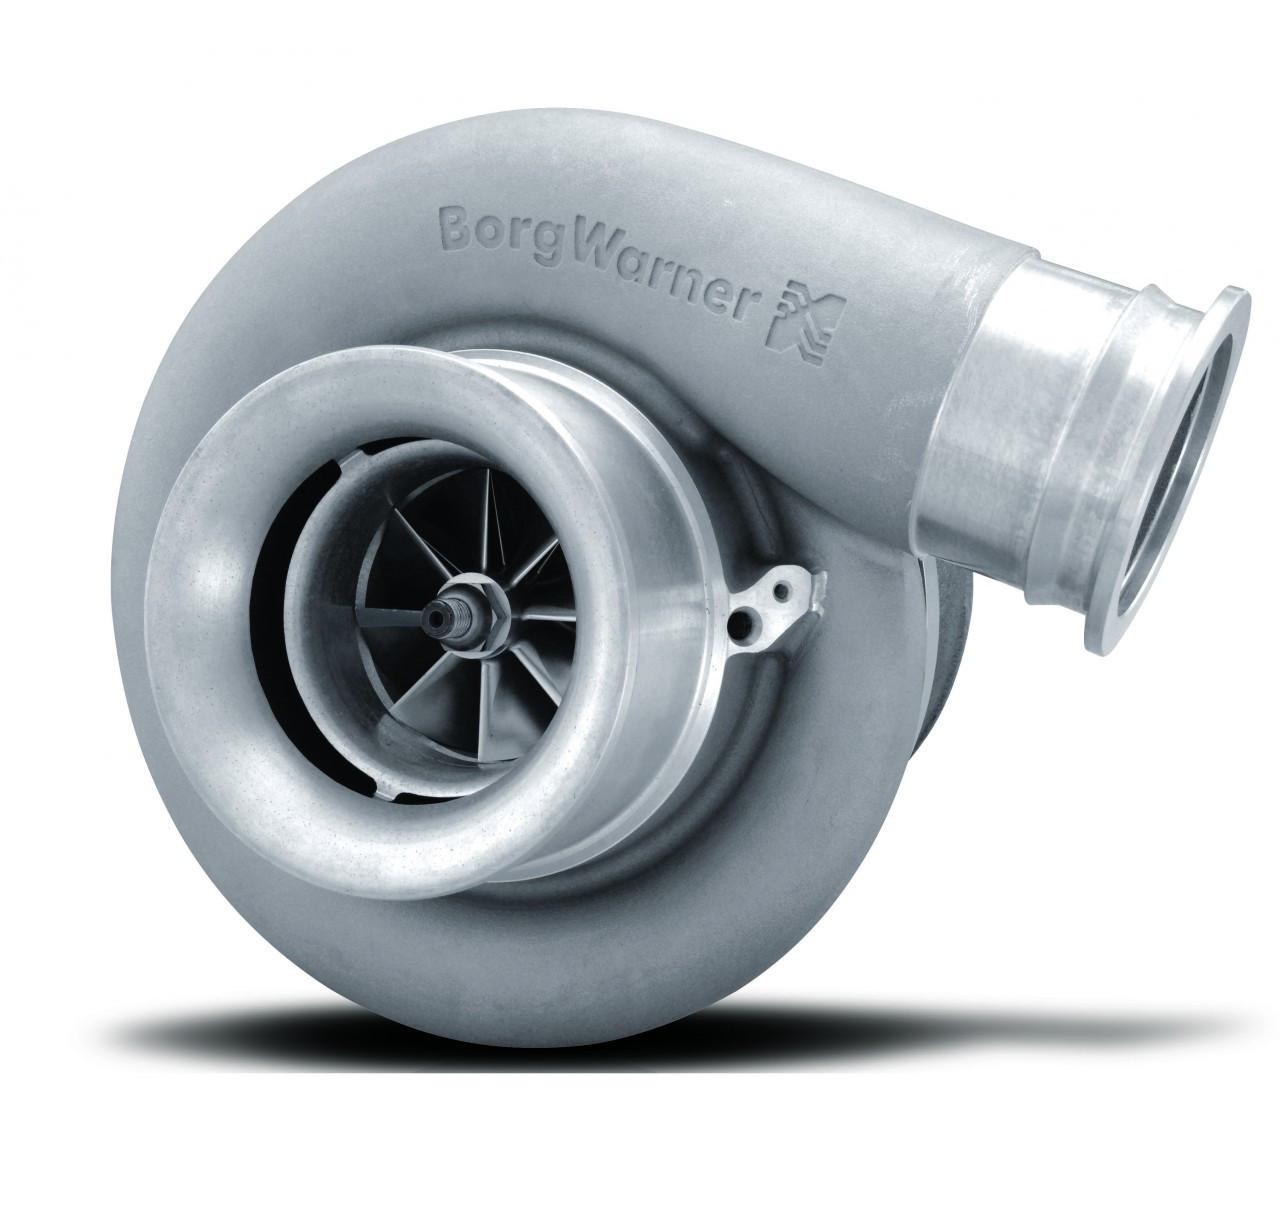 Shop Turbo Specific: Borg Warner S500SX Turbocharger (88mm)